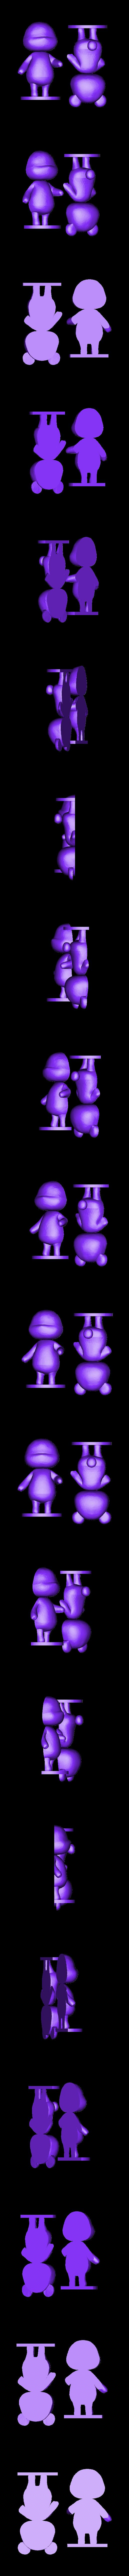 megan_split.stl Download free STL file Megan - Animal Crossing • 3D printable model, skelei